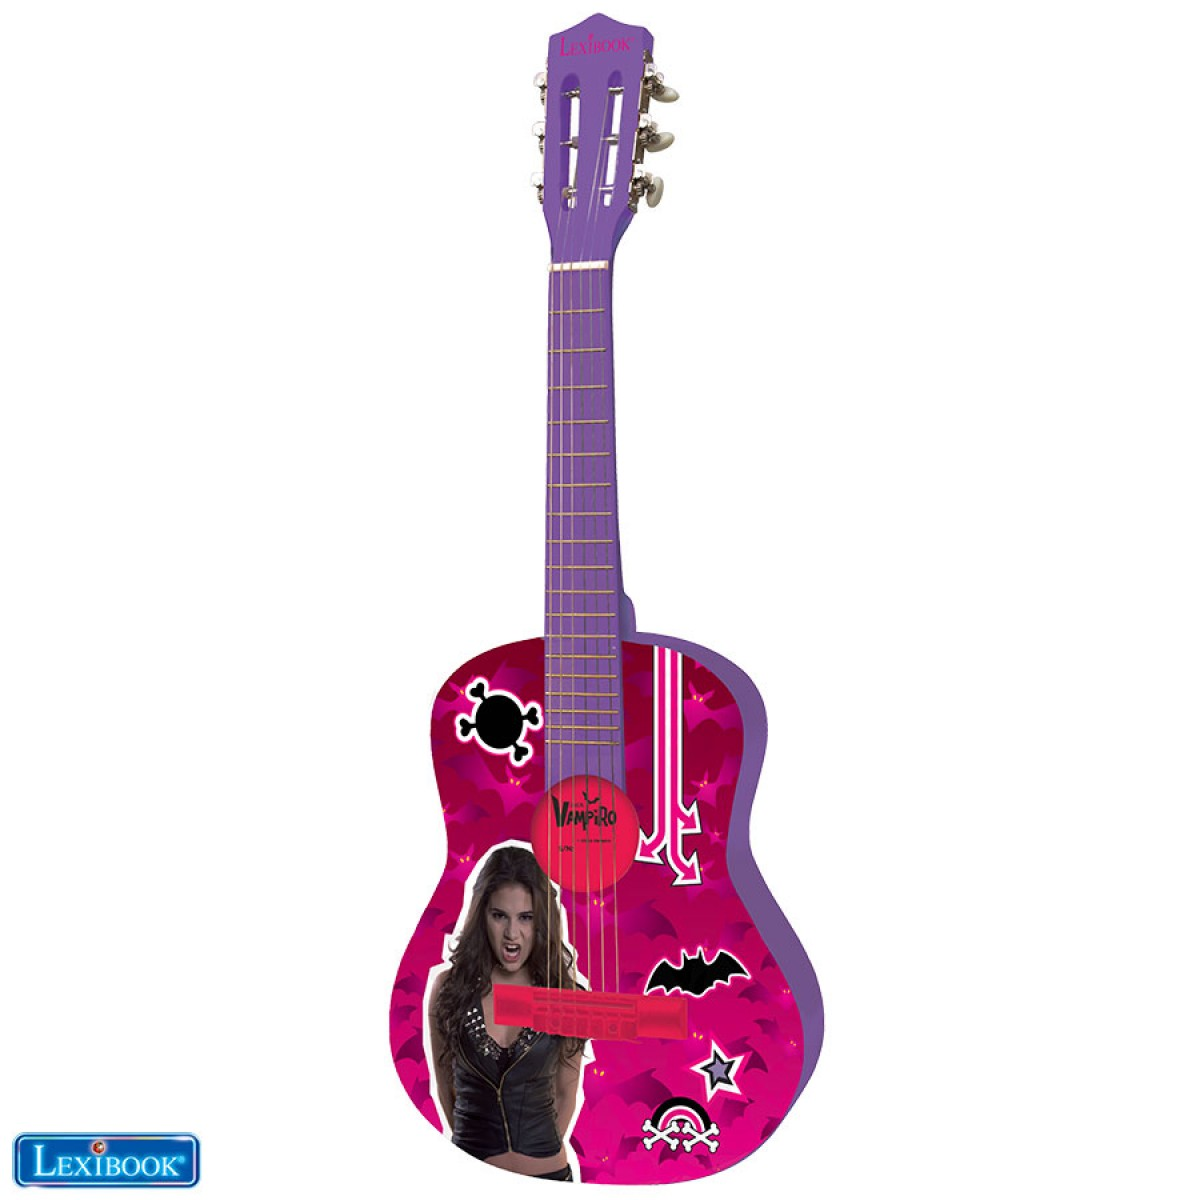 Guitare Acoustique Chica Vampiro - K2000CV - Lexibook